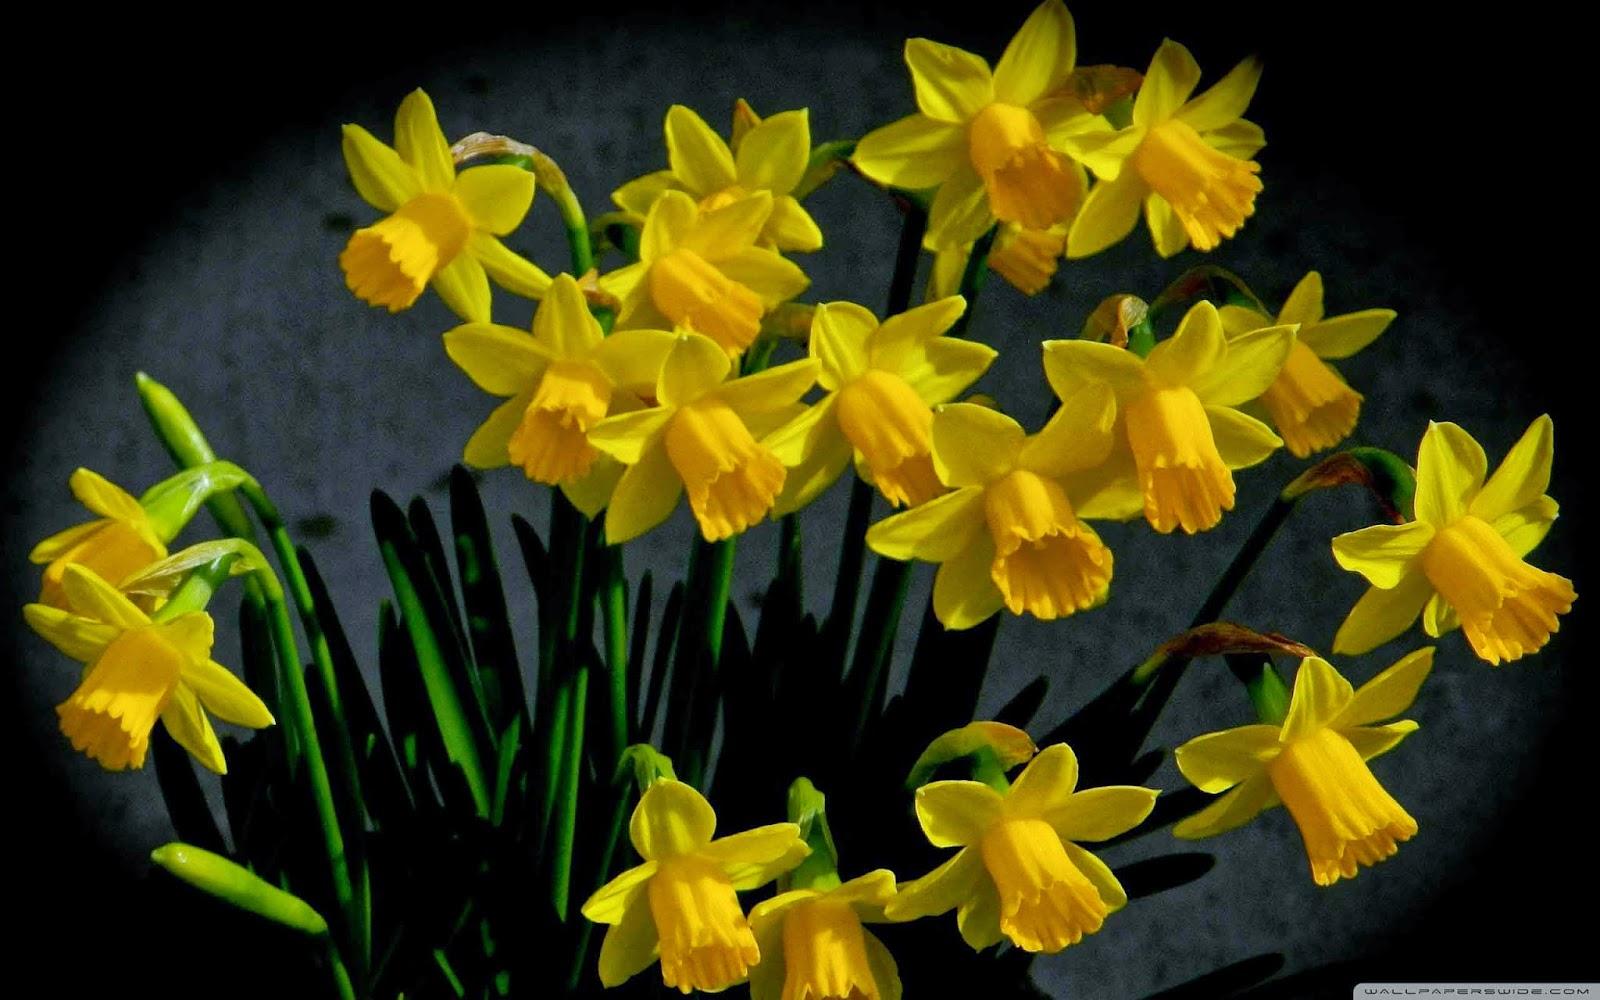 bursting into spring wallpaper